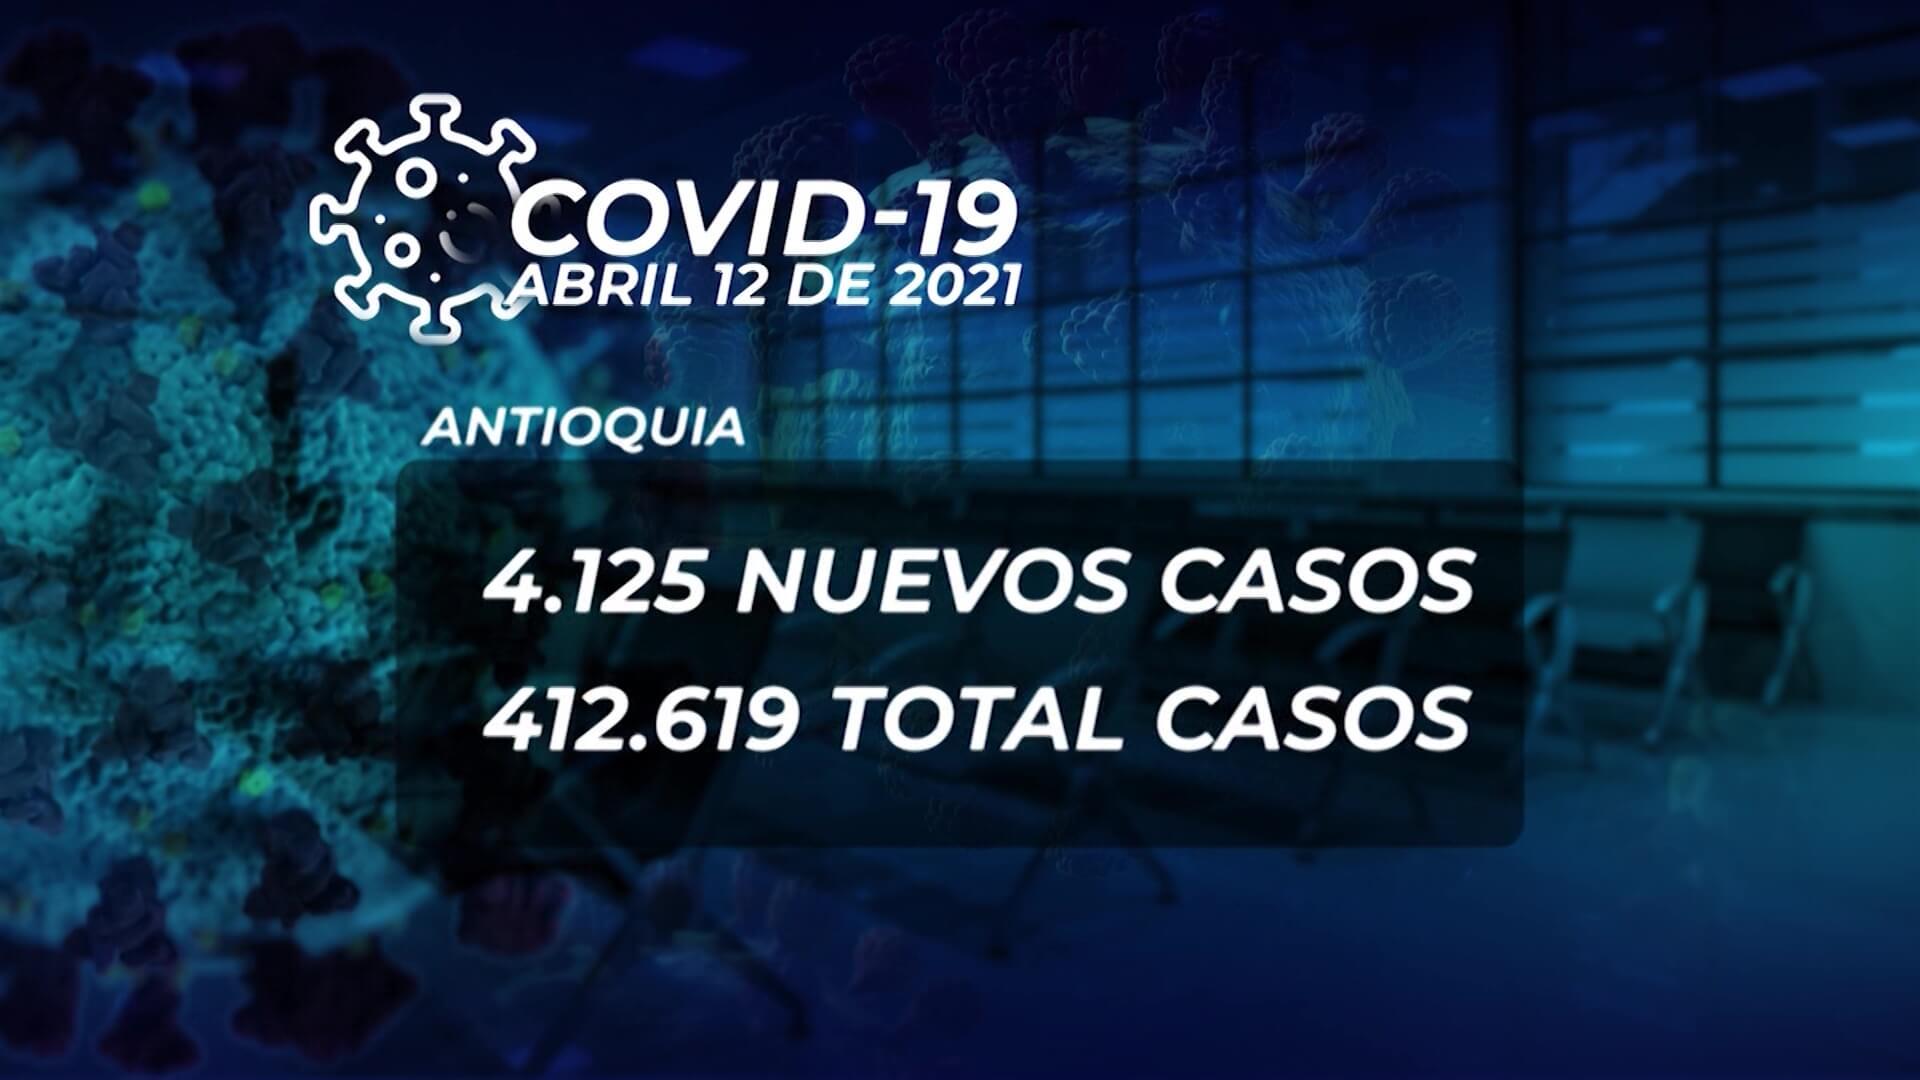 4.125 nuevos contagios hoy en Antioquia